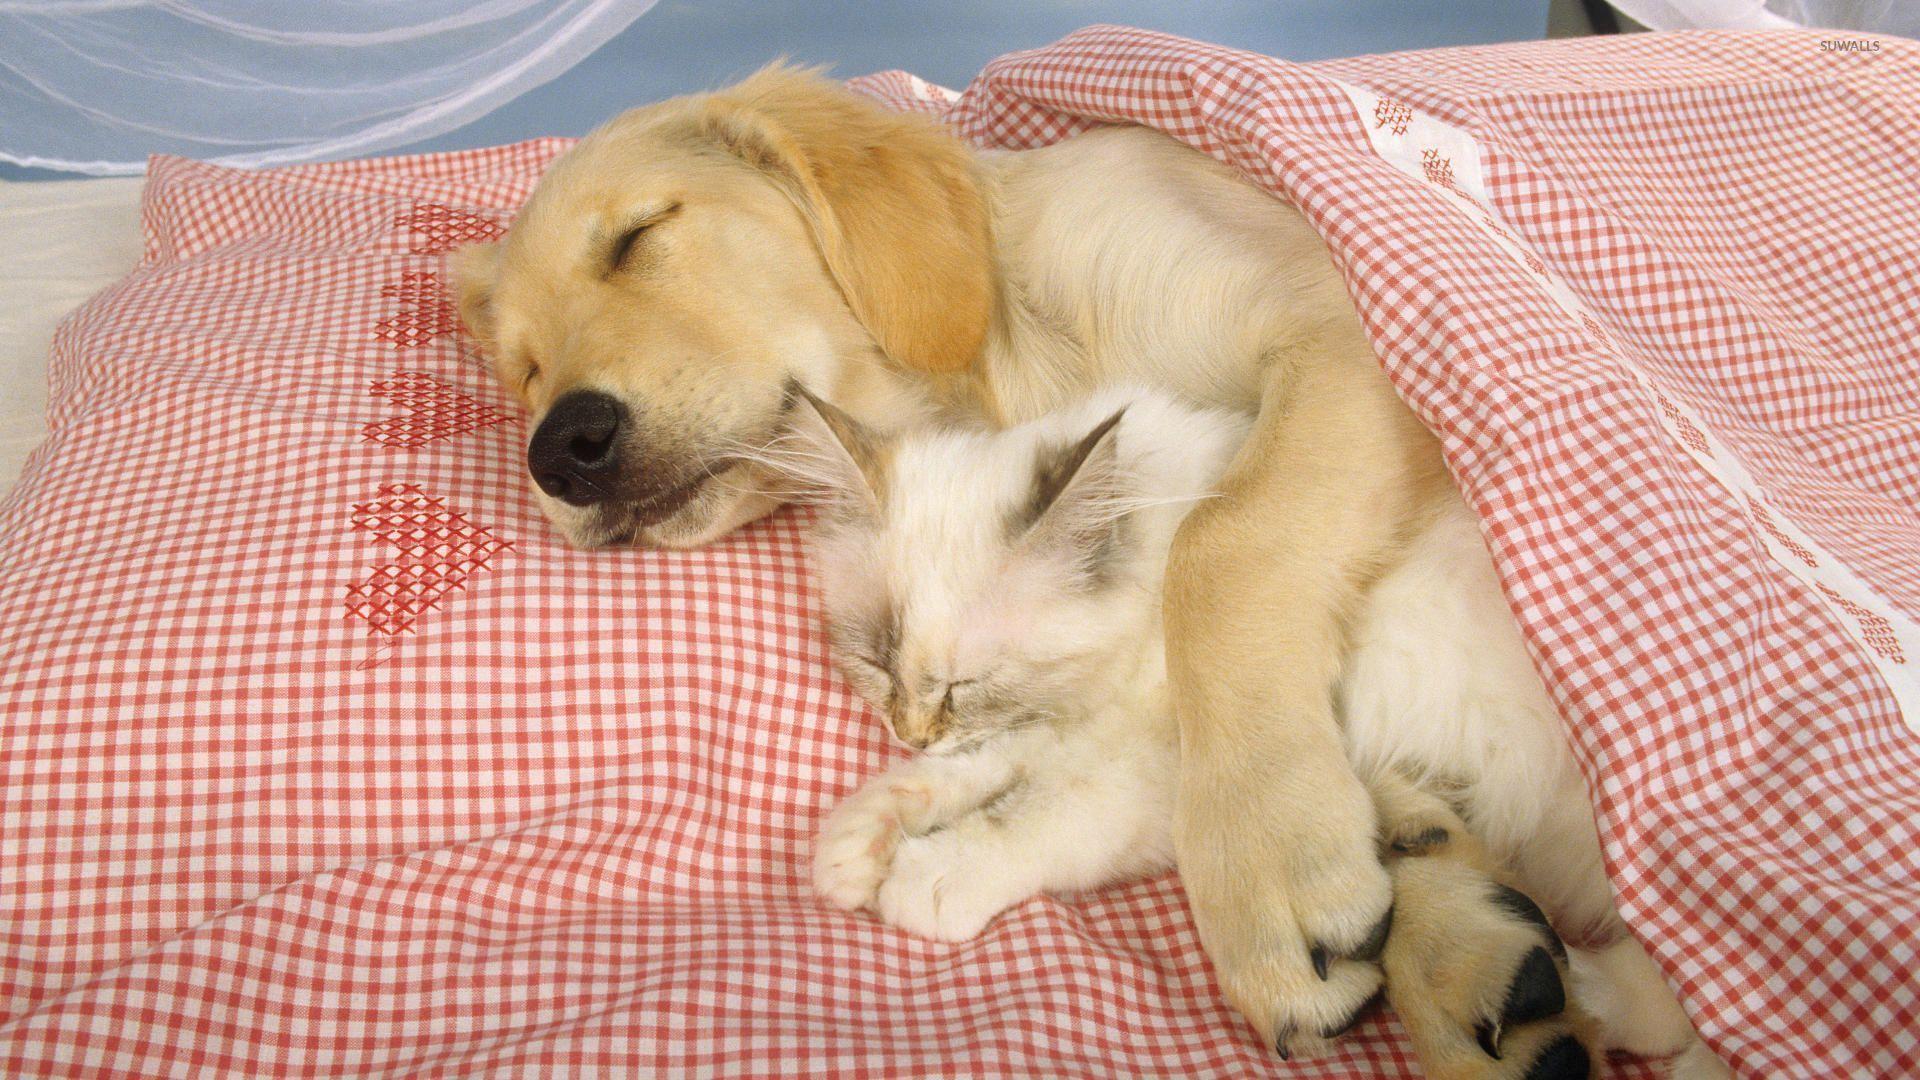 Sleeping Dog Holding A Cute Kitten Wallpaper Animal Wallpapers